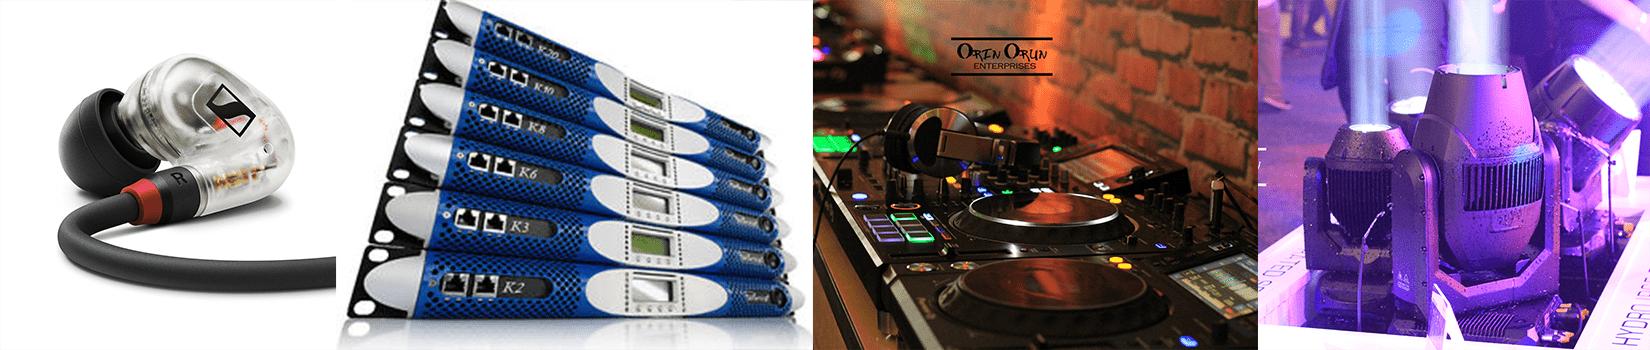 Orin Orun Enterprises Limited